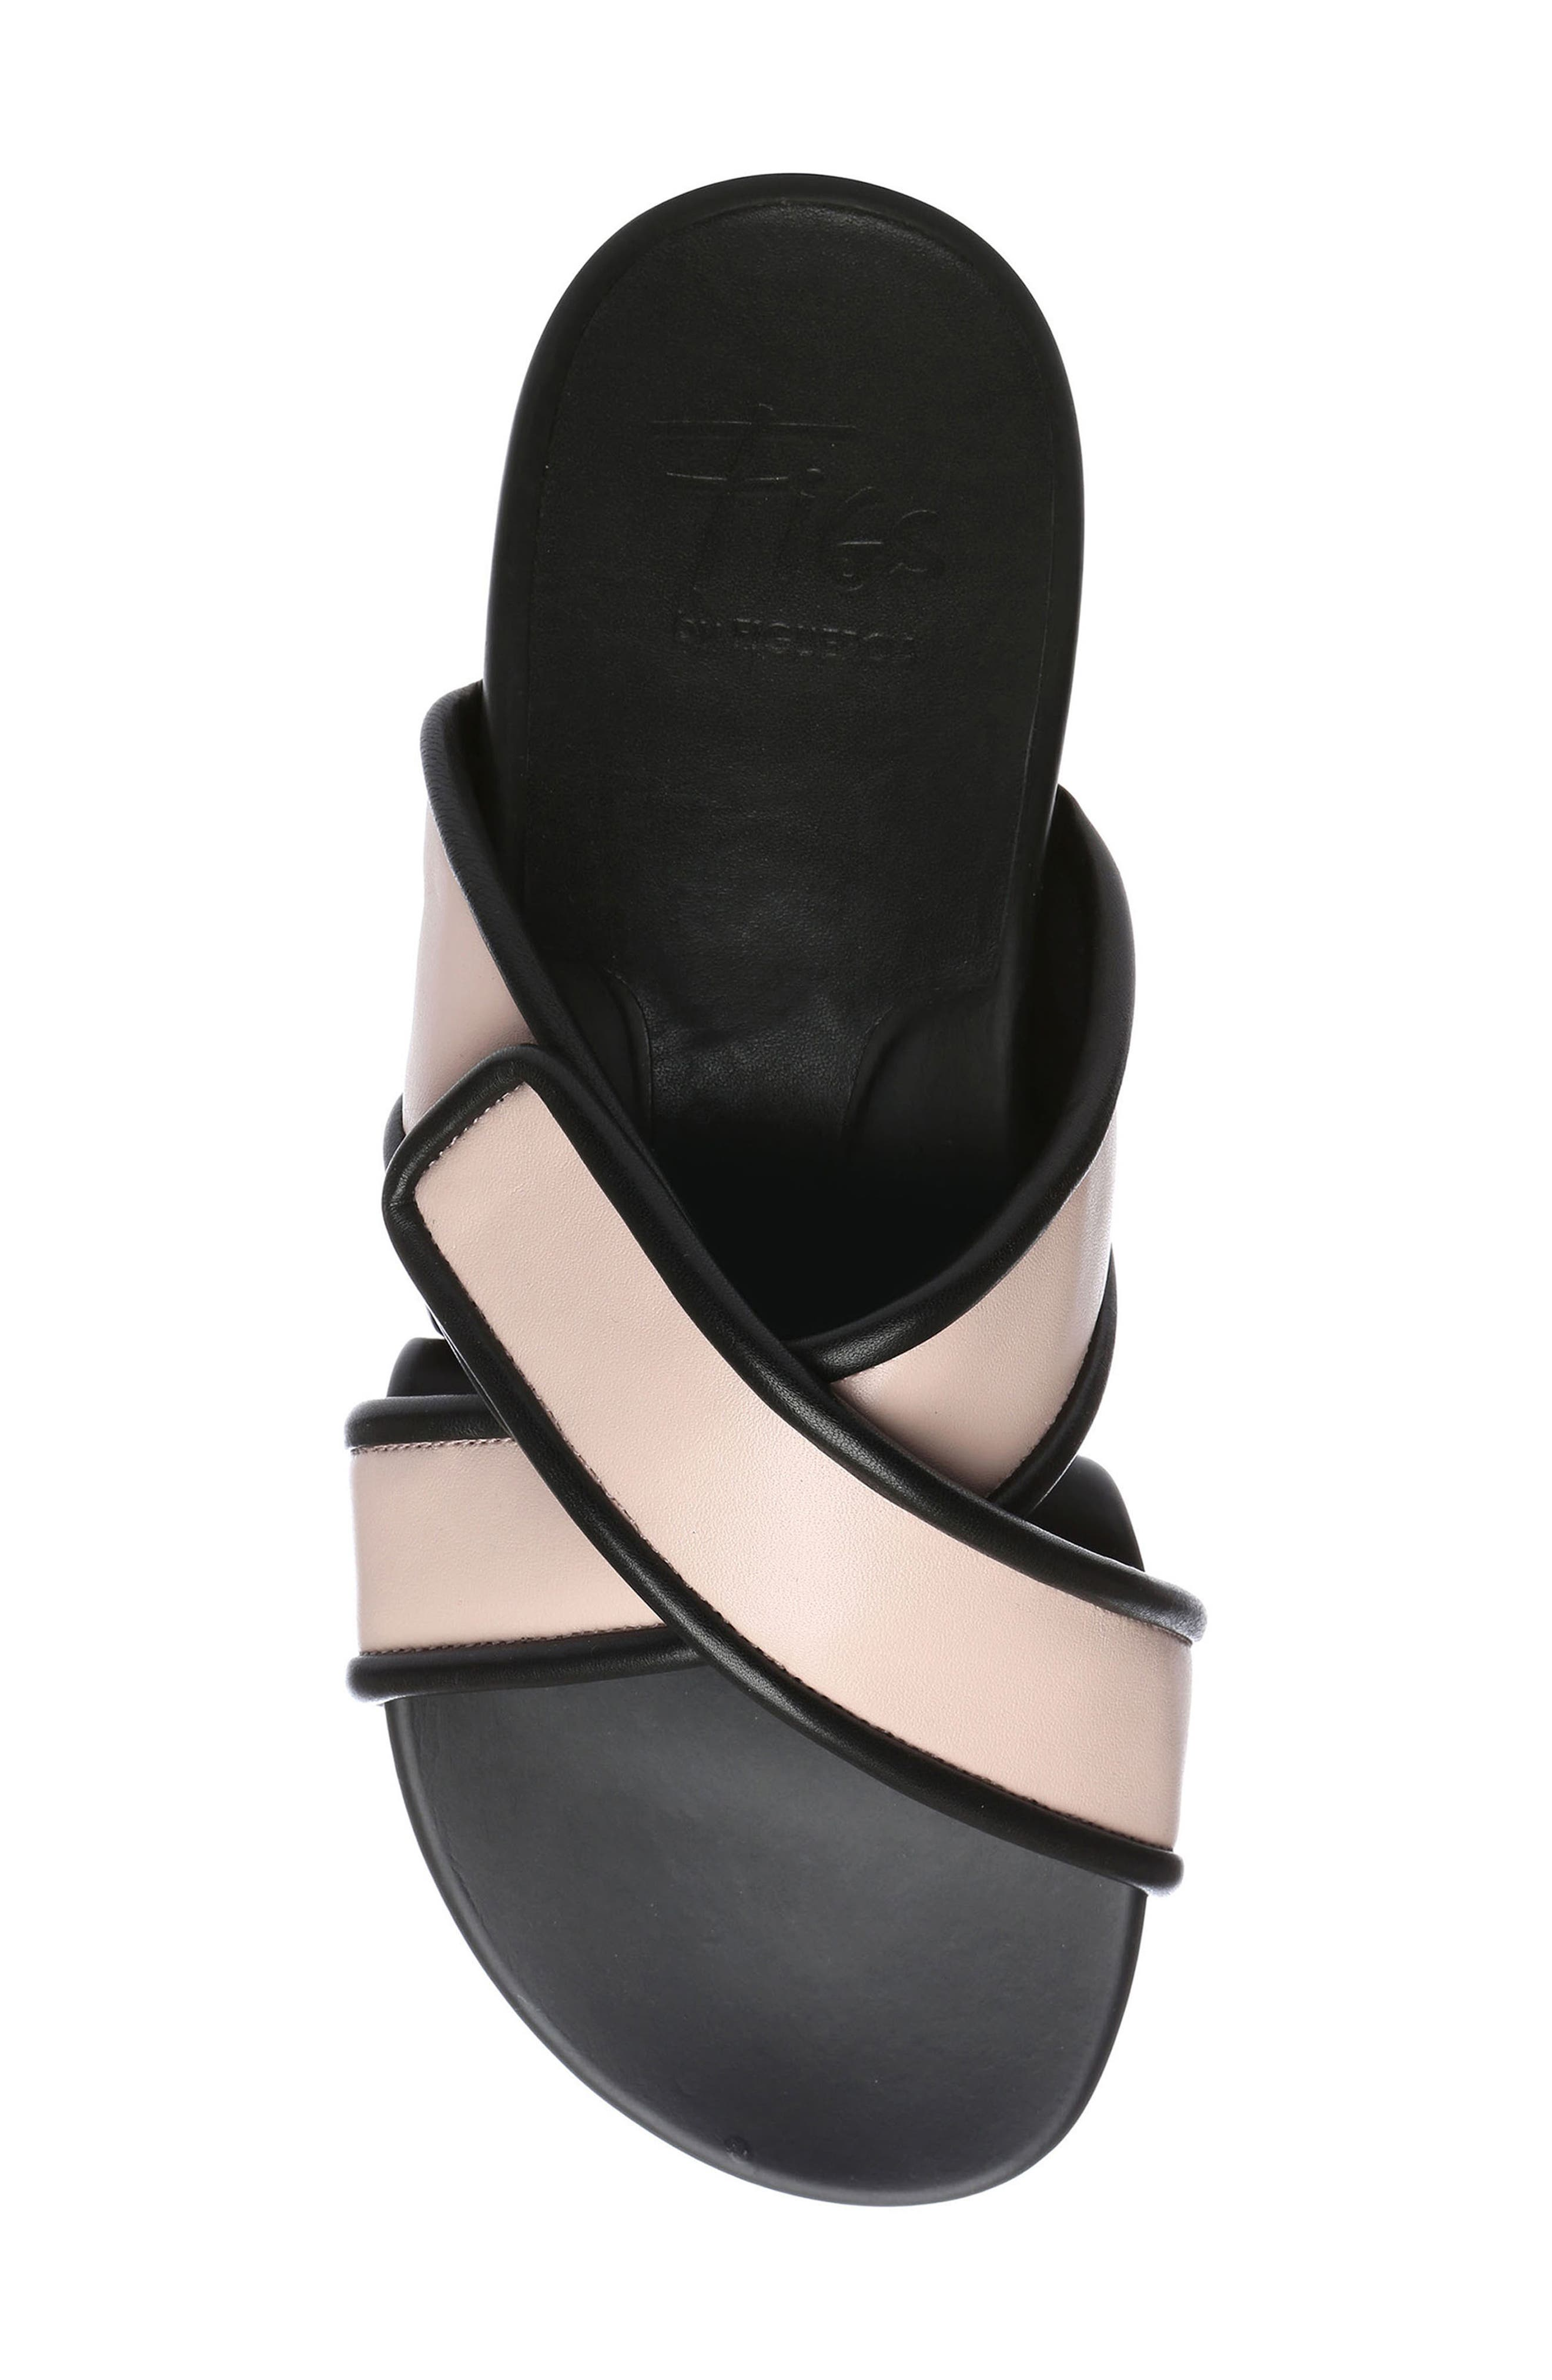 Figomatic Slide Sandal,                             Alternate thumbnail 5, color,                             PINK NAPPA LEATHER